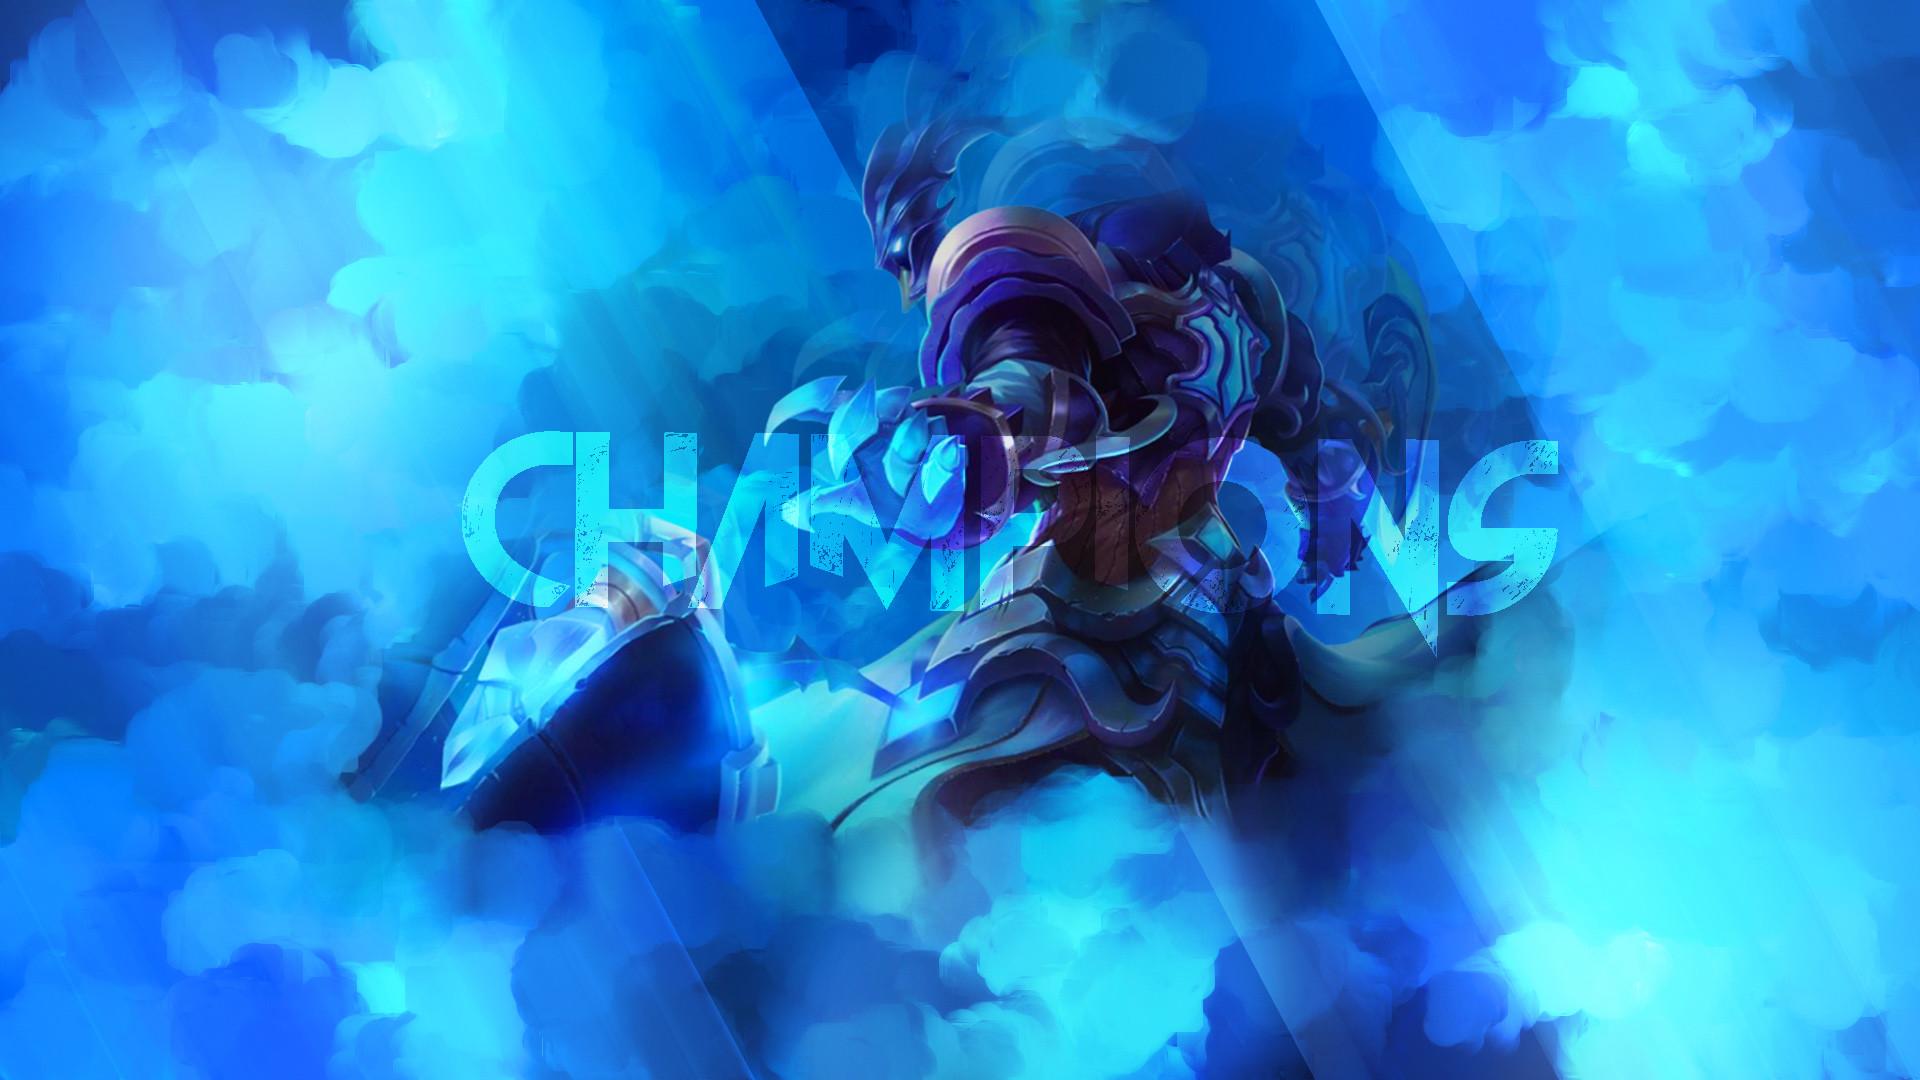 Championship Thresh by Platna HD Wallpaper Fan Art Artwork League of  Legends lol